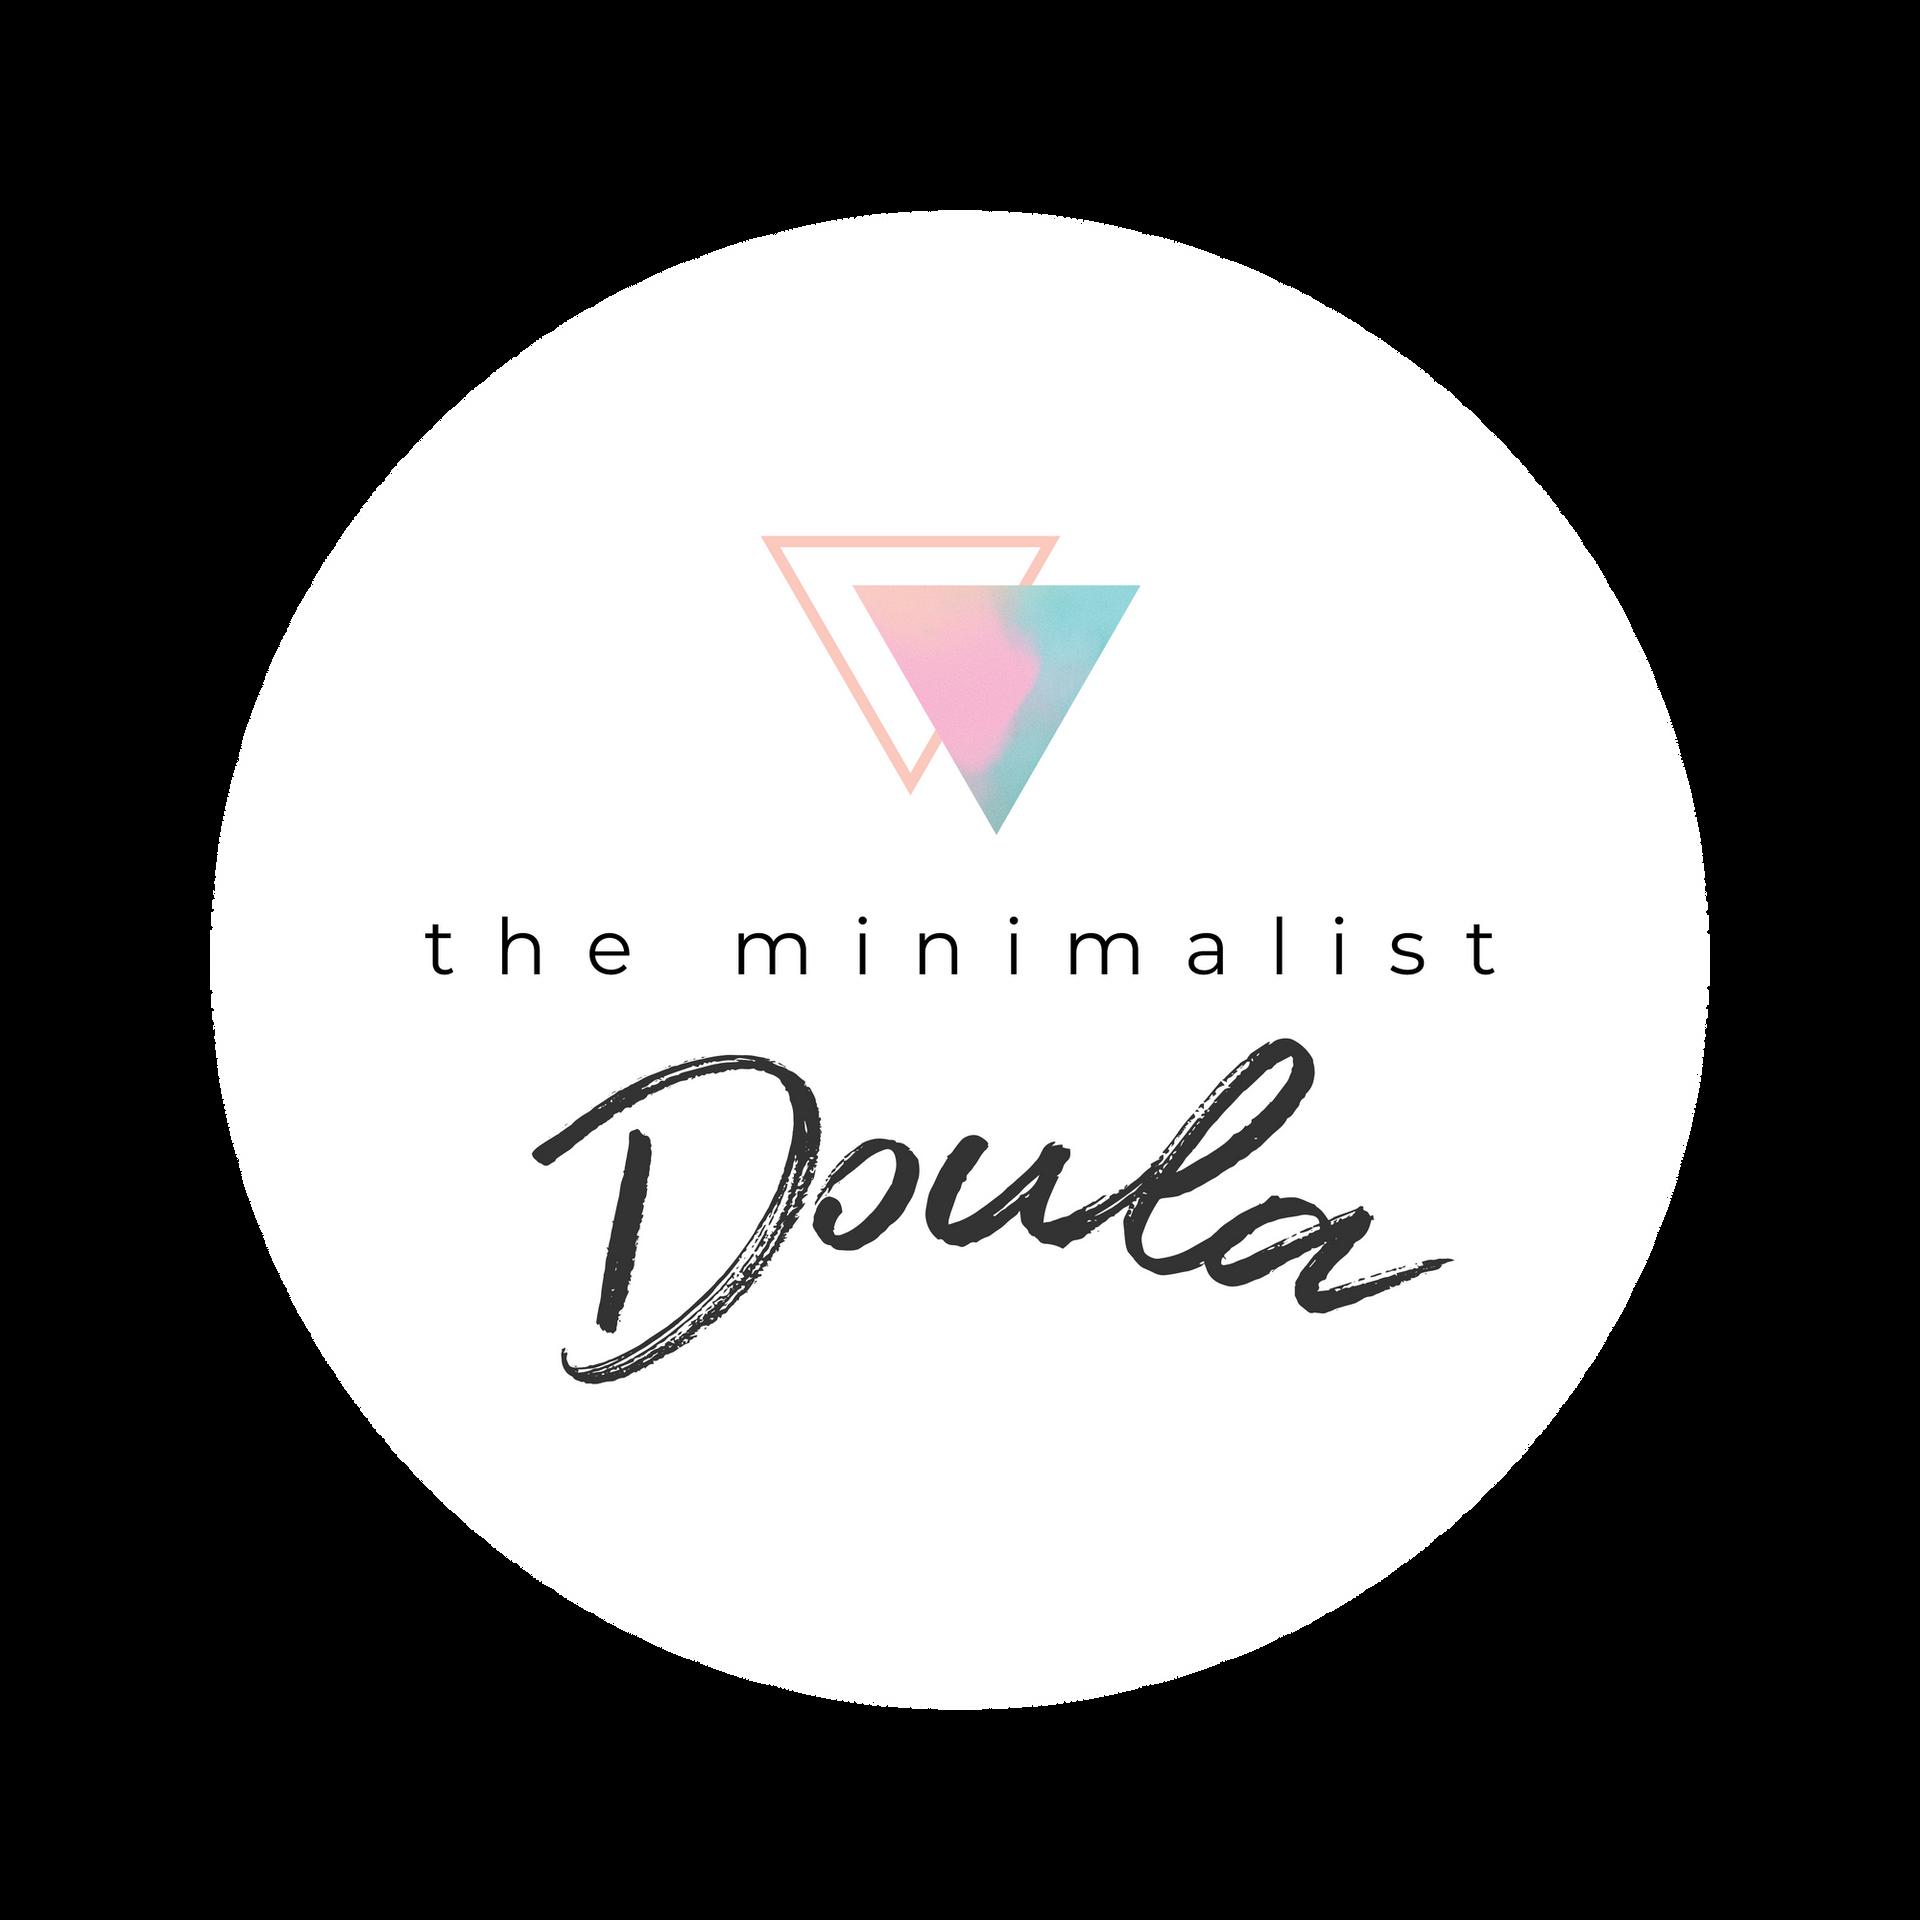 Doula Branding | Brand Identity Design by Fresh Leaf Creative | Dorset Brand Designer & Photographer